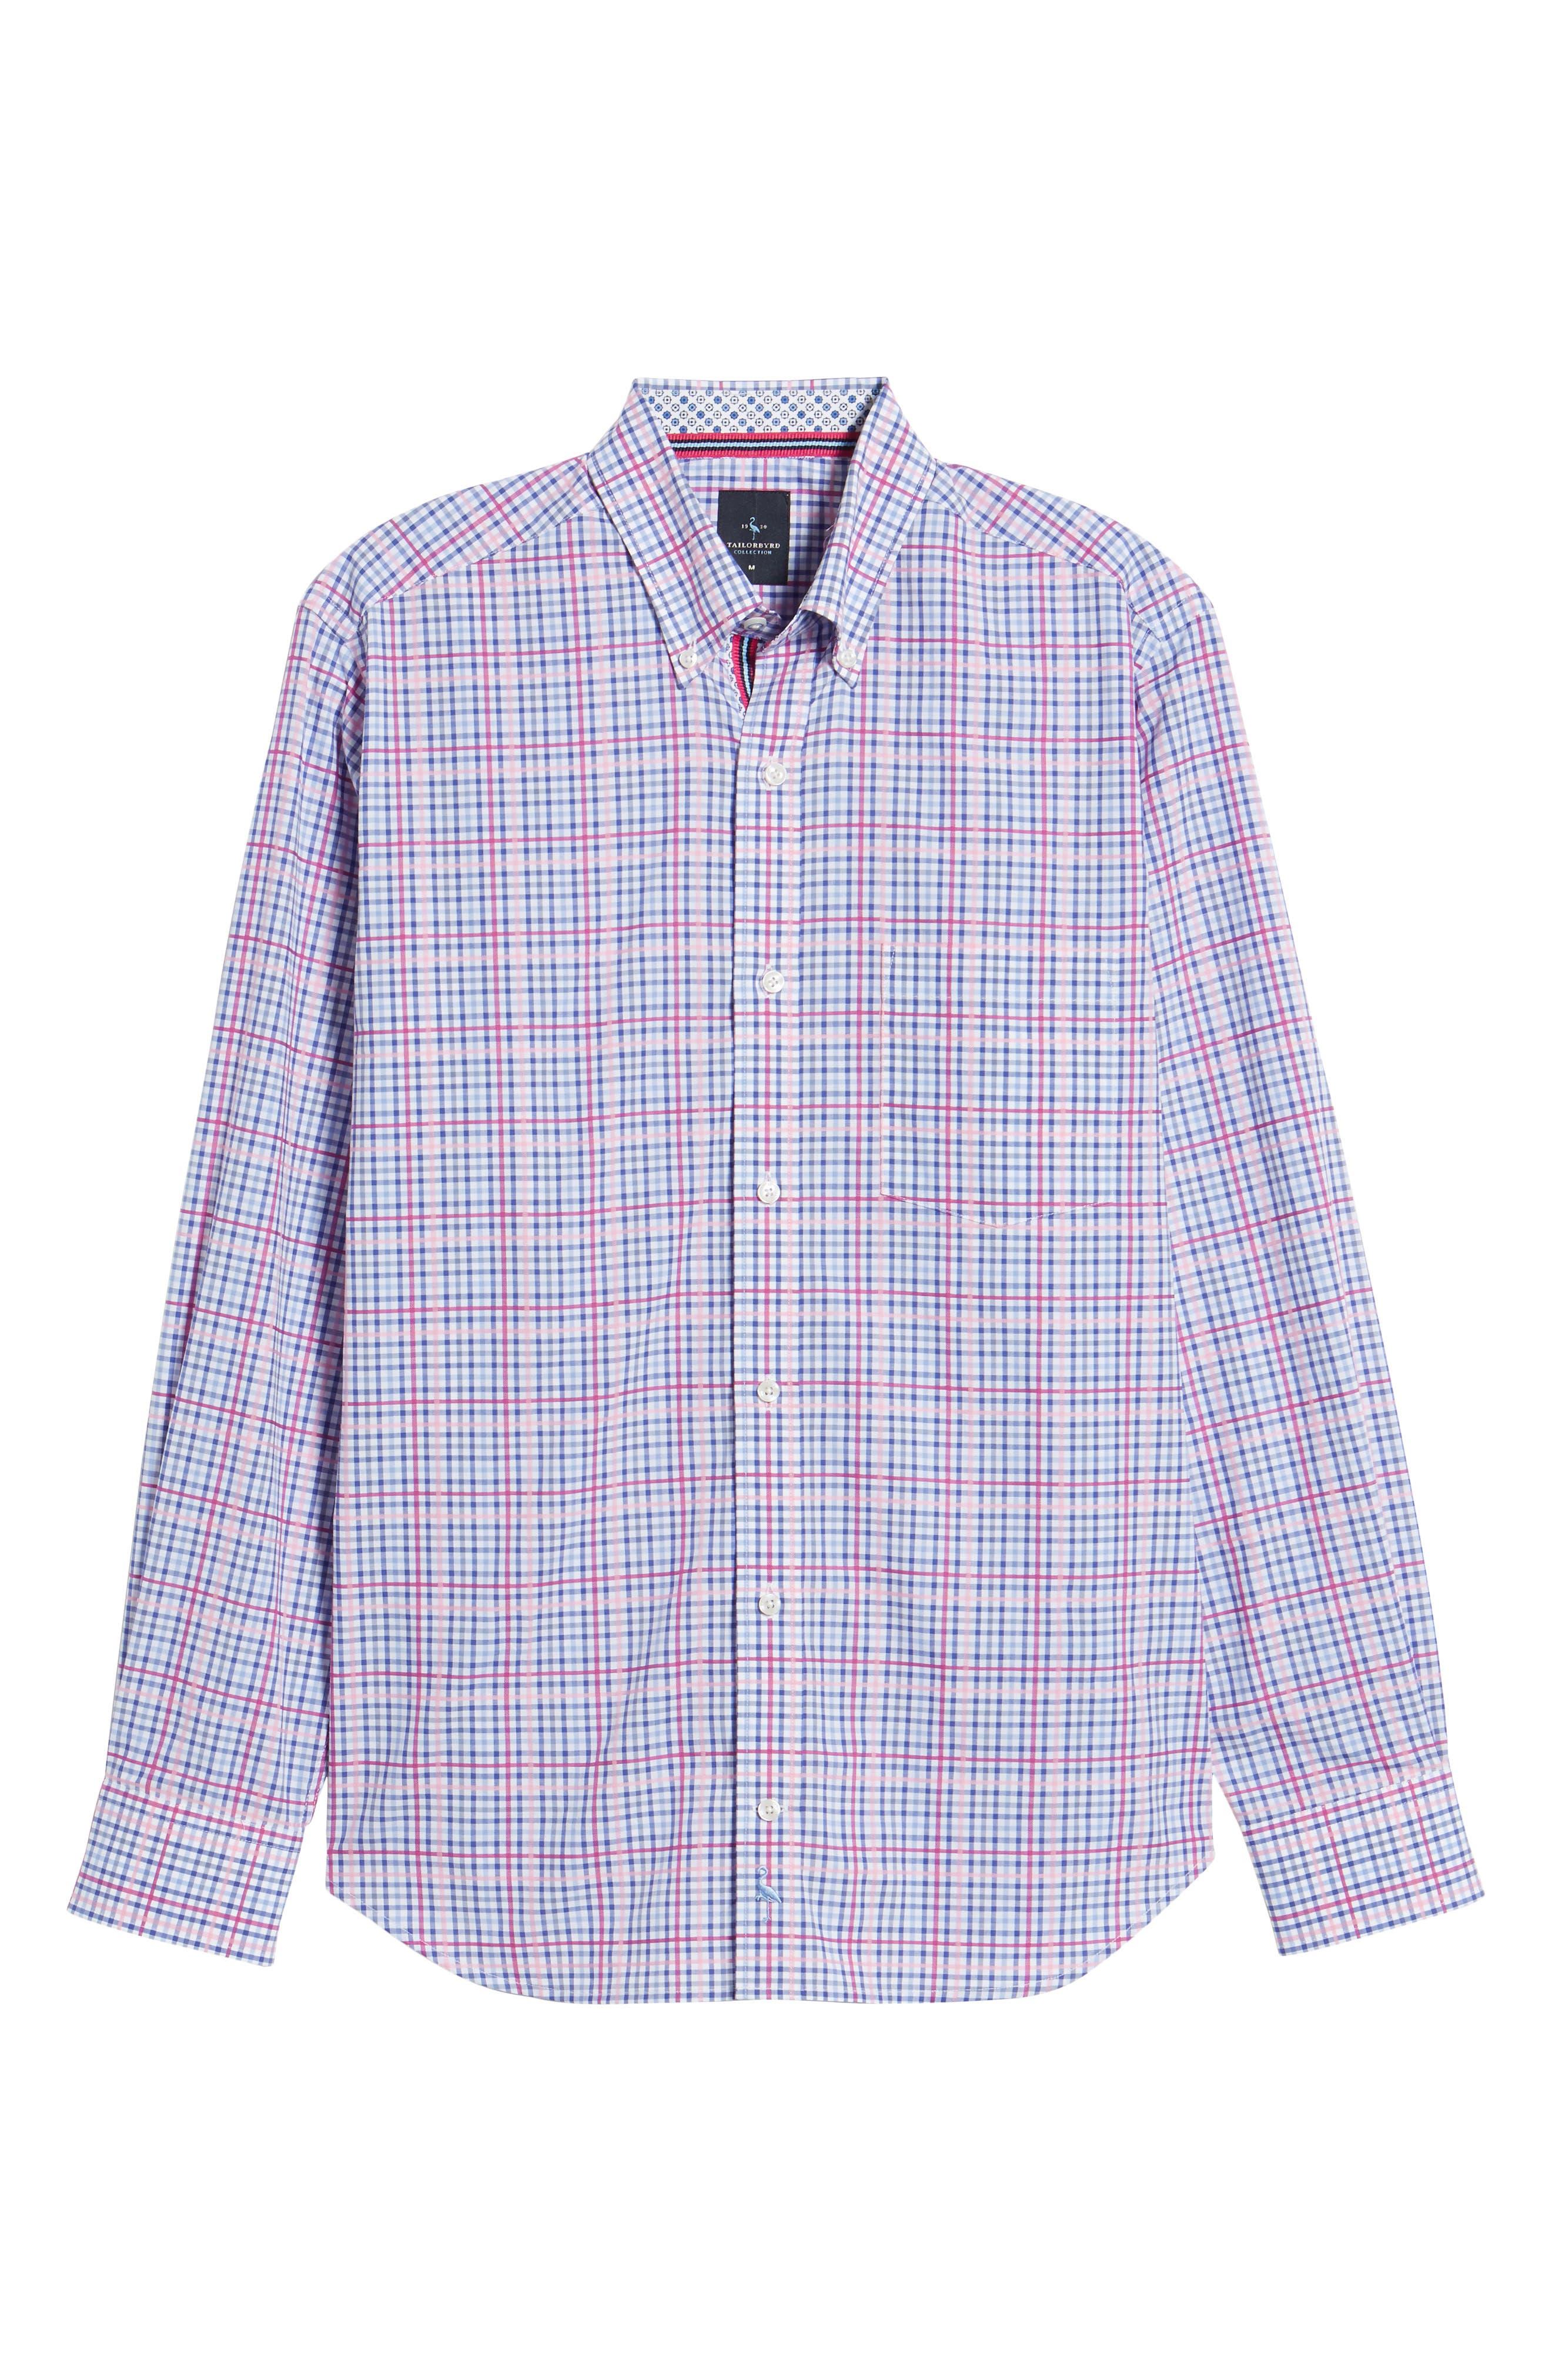 Aidren Regular Fit Plaid Sport Shirt,                             Alternate thumbnail 6, color,                             Pink